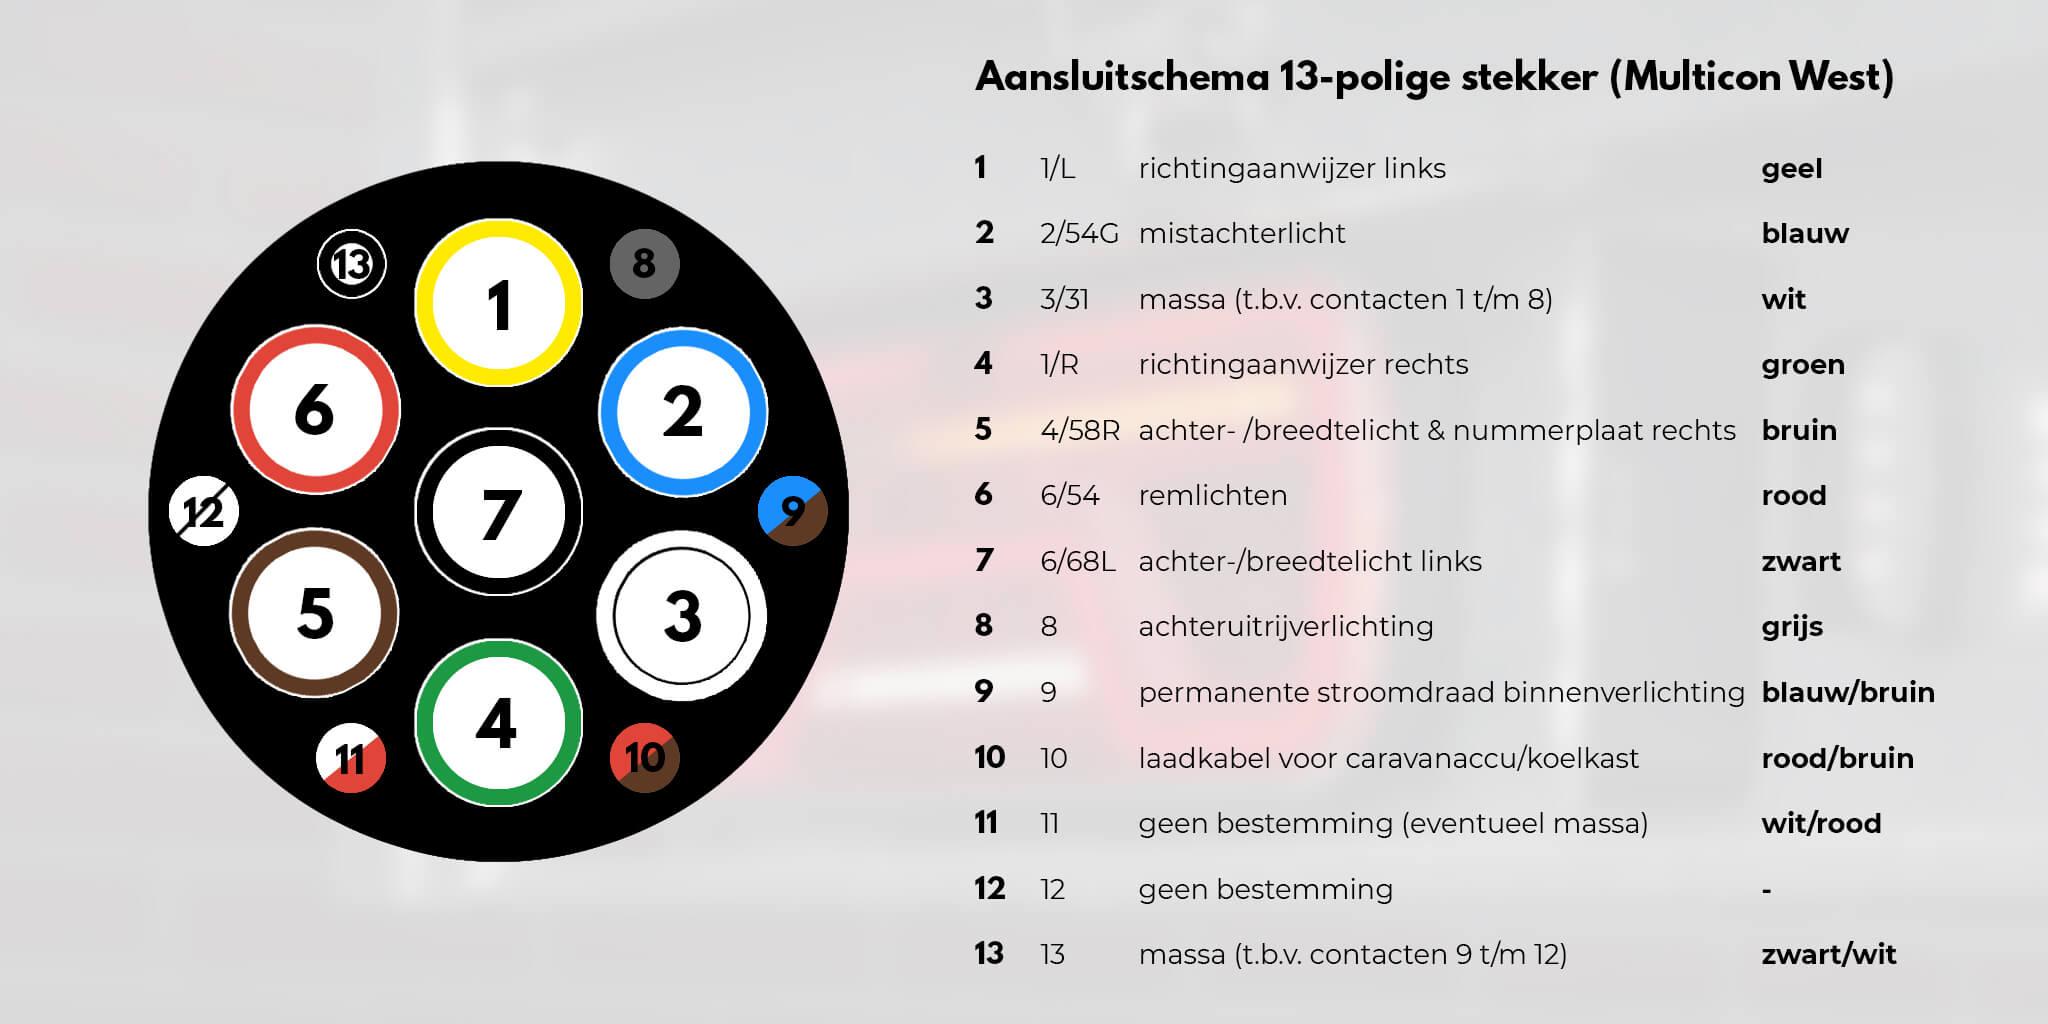 Aansluitschema-13-polige-stekker-multicon-west